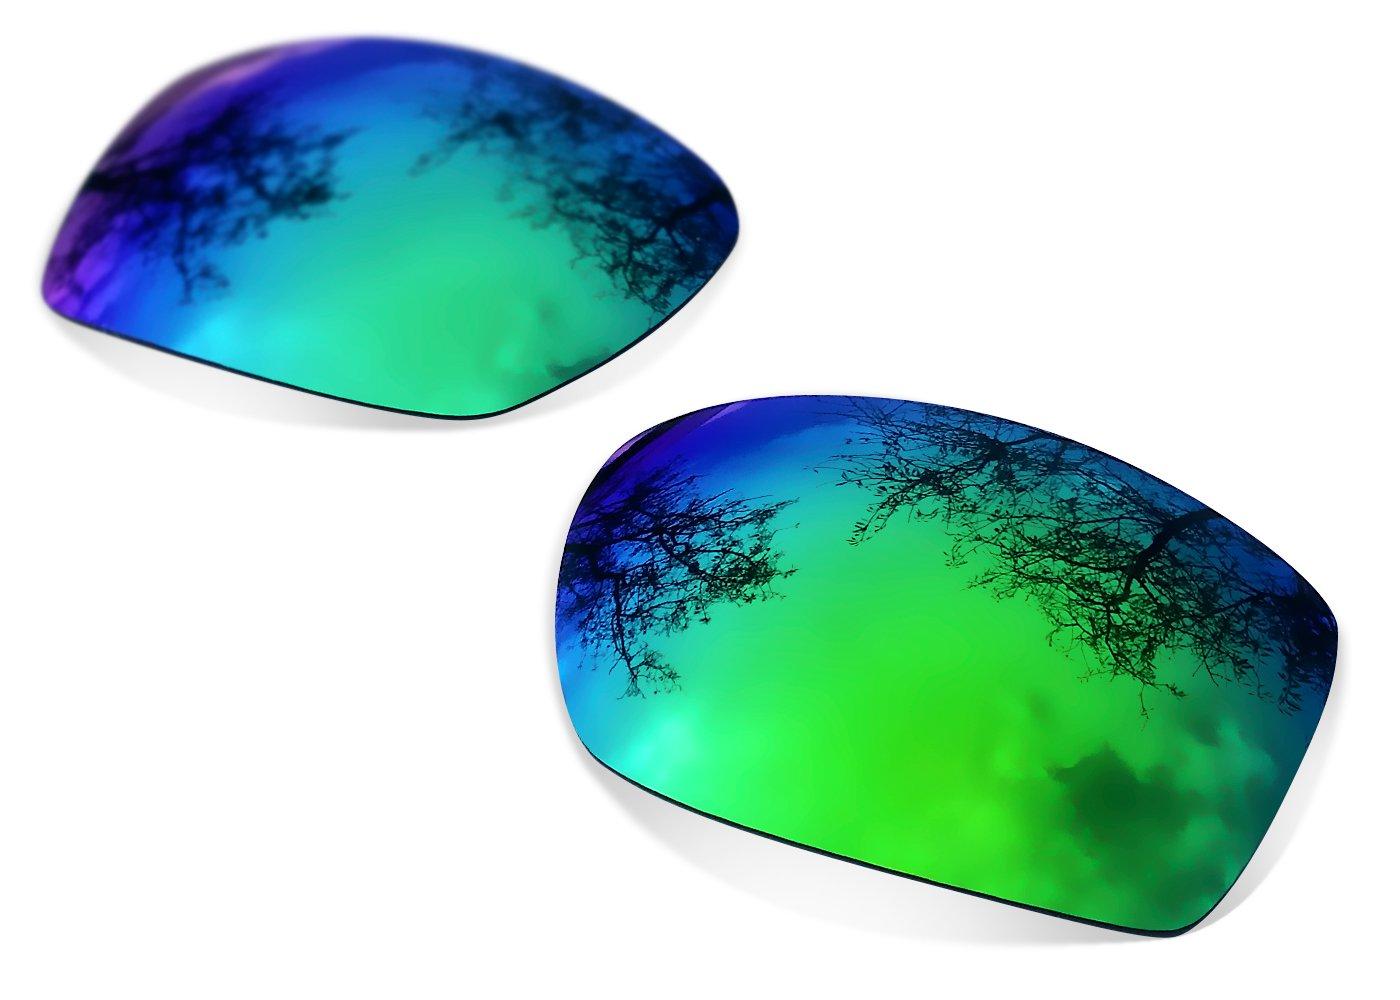 Sunglasses Restorer Lentes Polarizadas de Recambio Sapphire Green para Oakley Big Taco